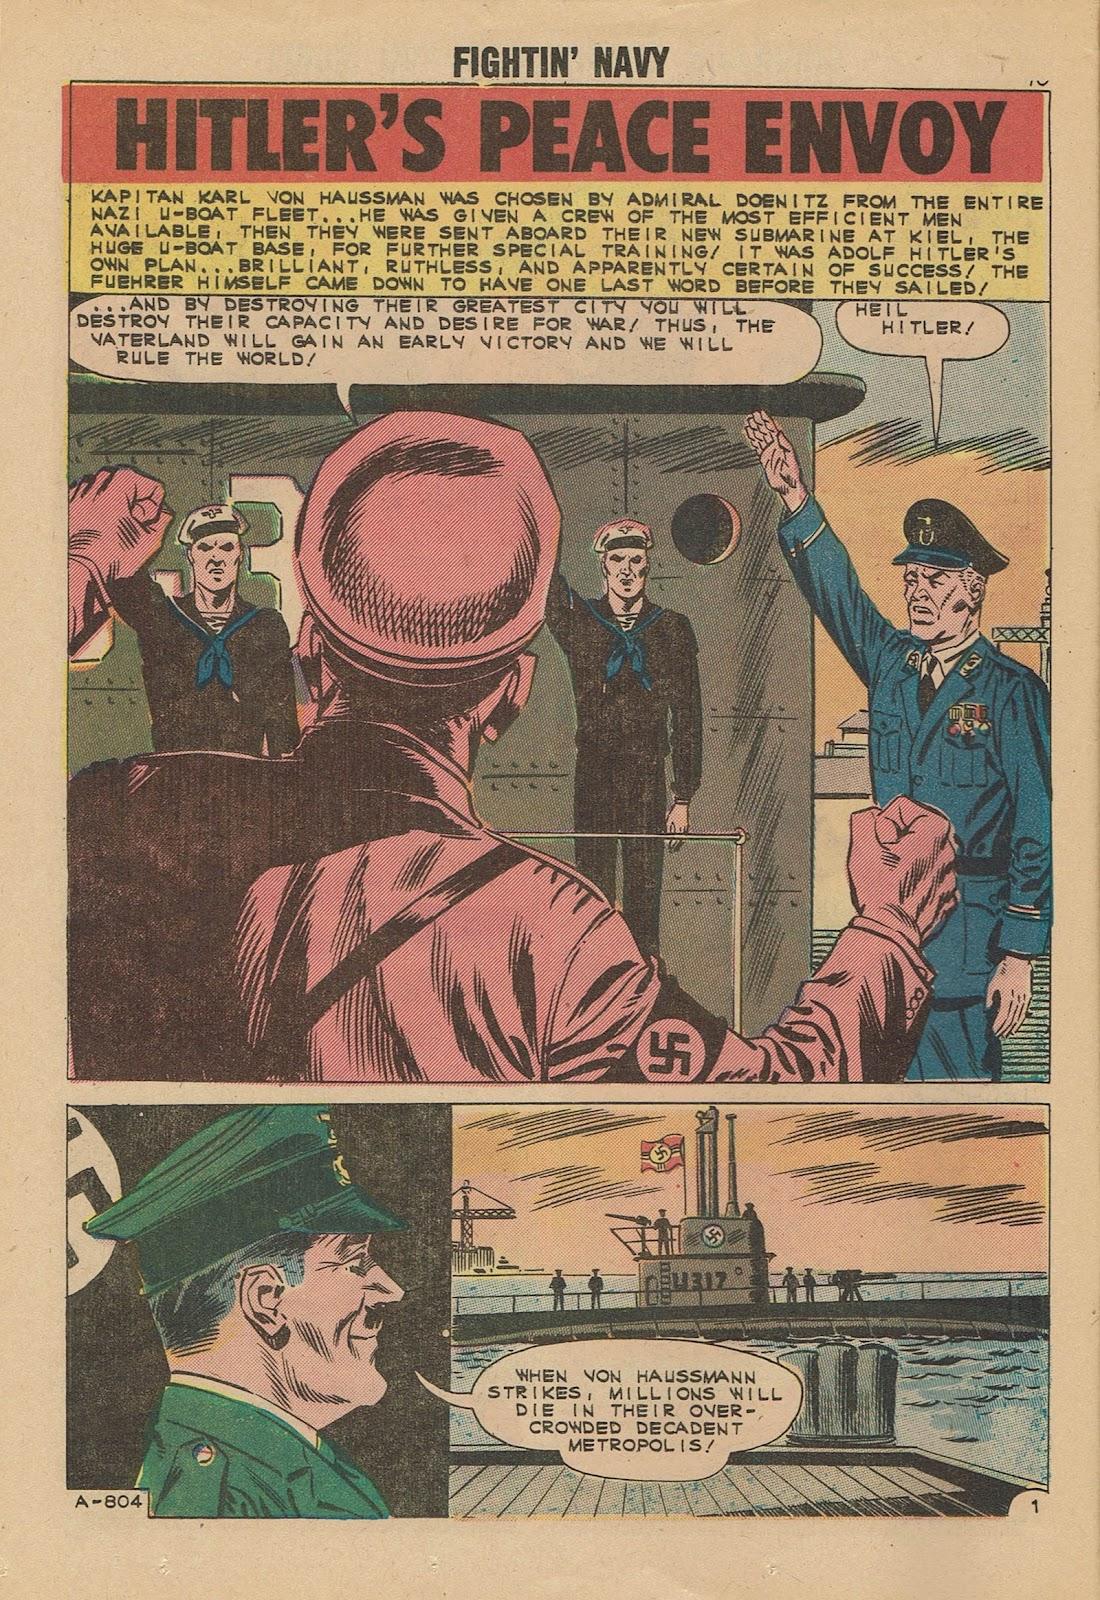 Read online Fightin' Navy comic -  Issue #101 - 12